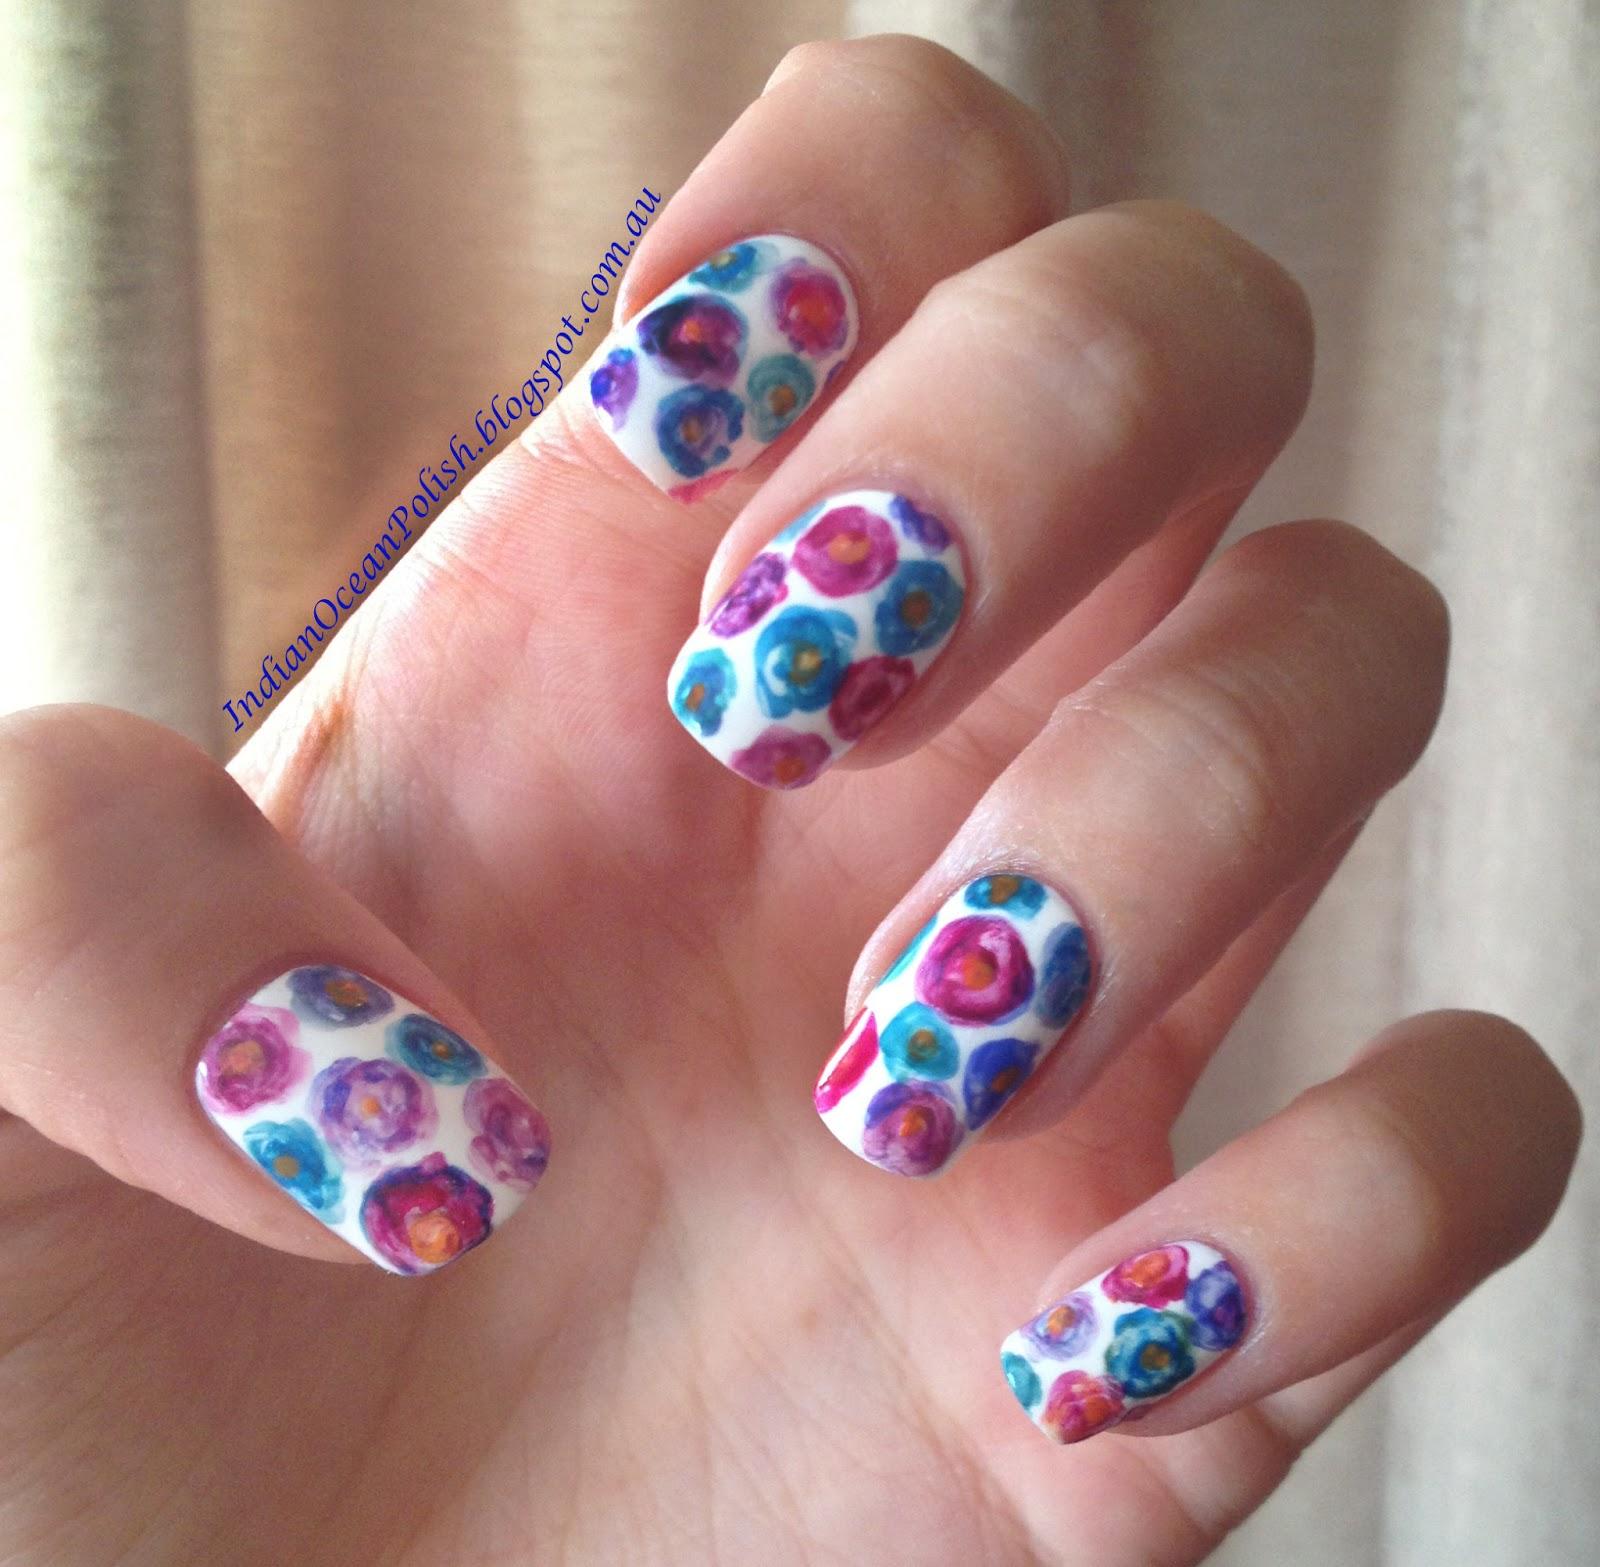 Indian Ocean Polish: Simple Watercolour Flower Nail Art